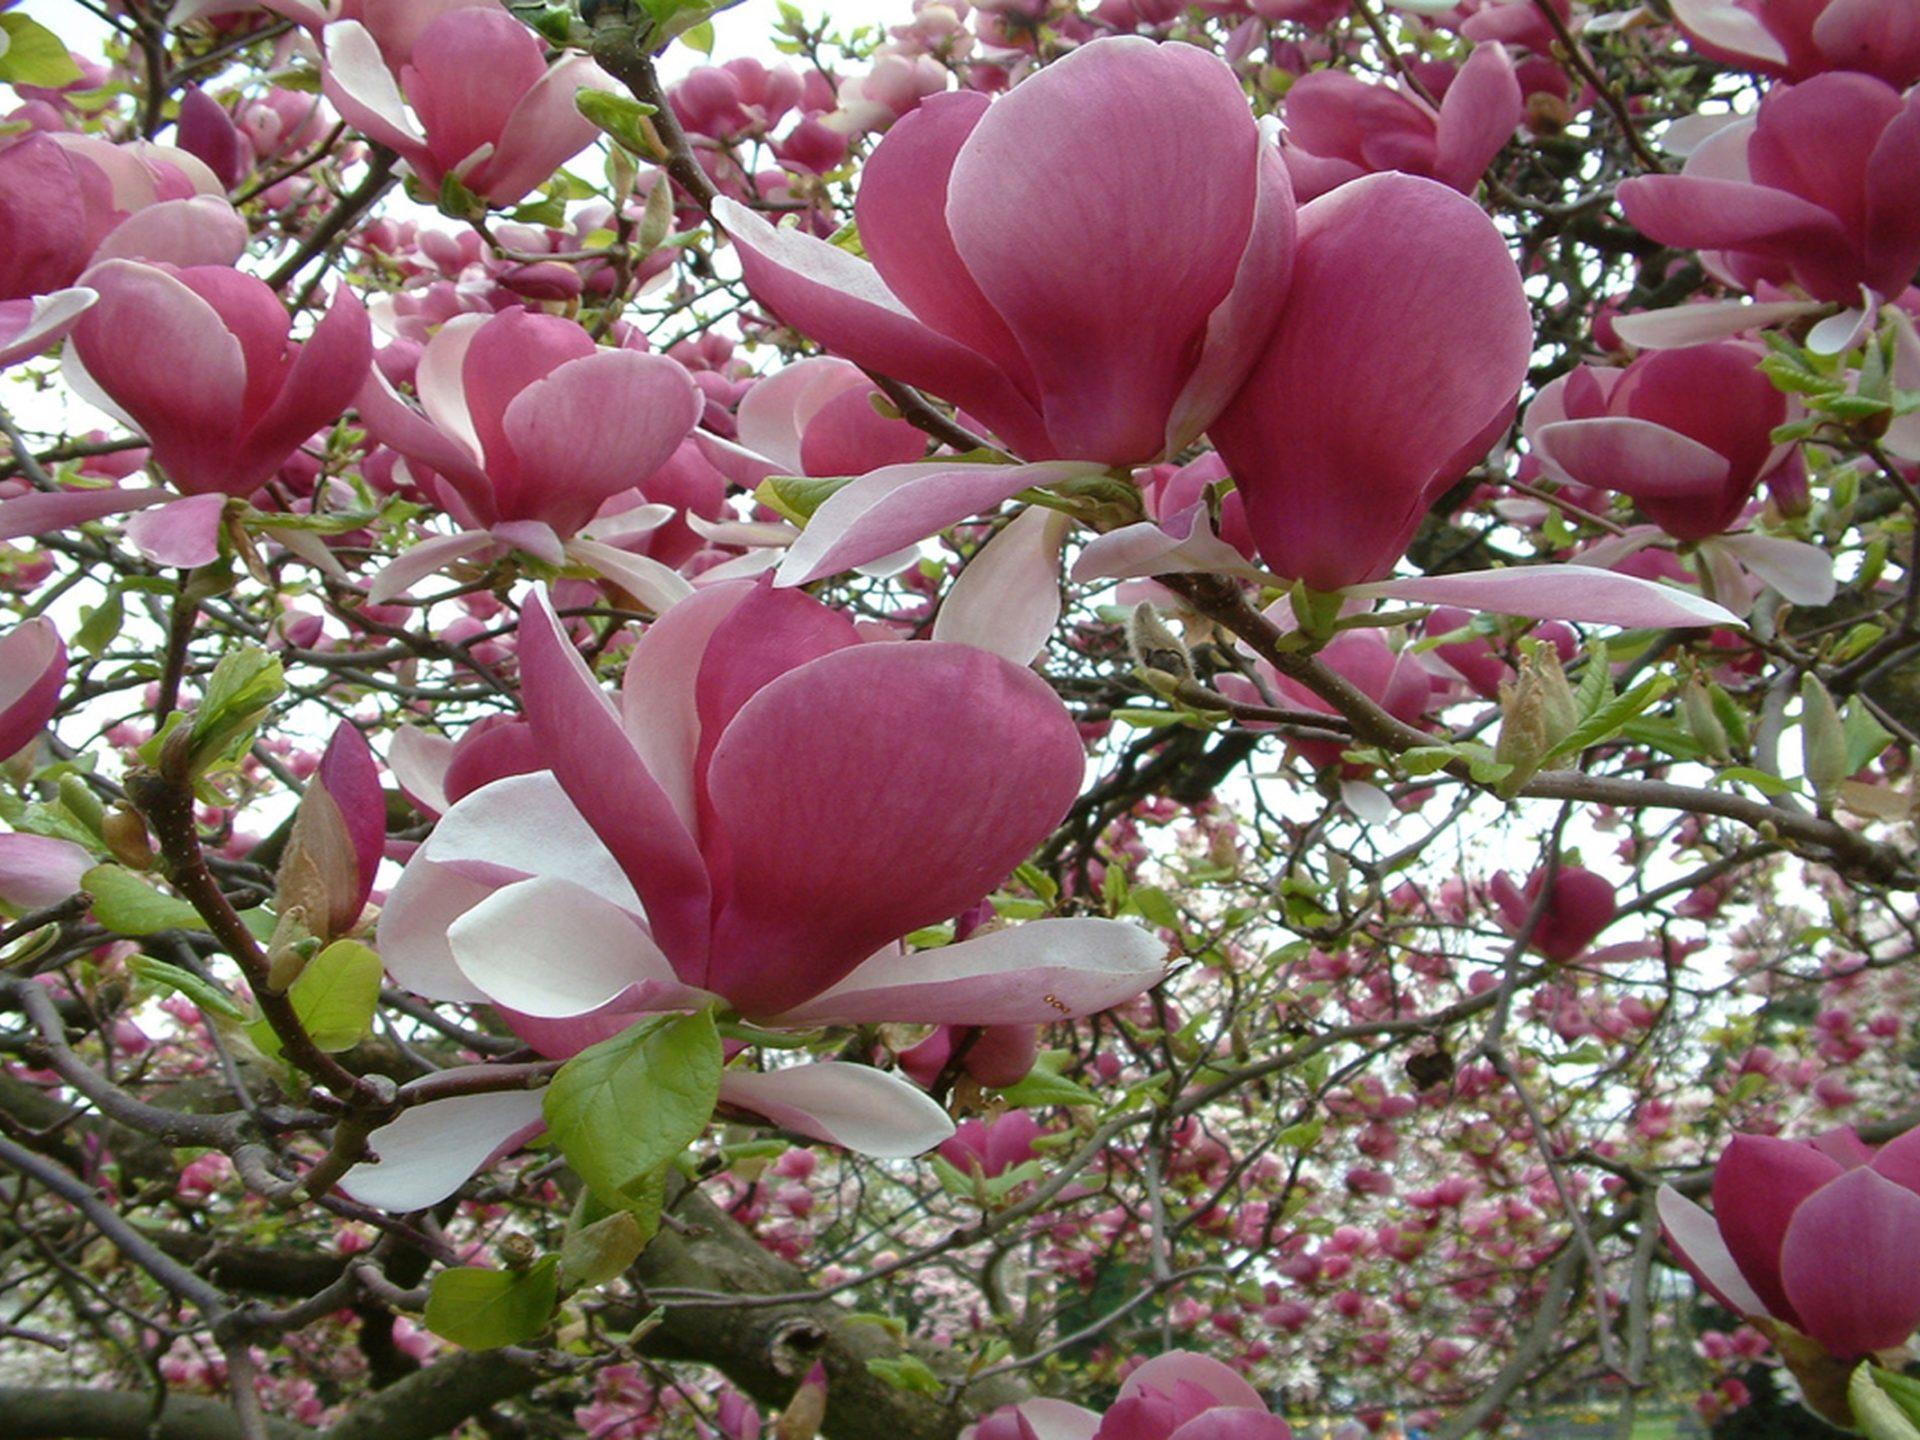 Cute Bunny Wallpaper Hd Magnolia Tree Pink Flower Wallpaper For Desktop 2560x1600